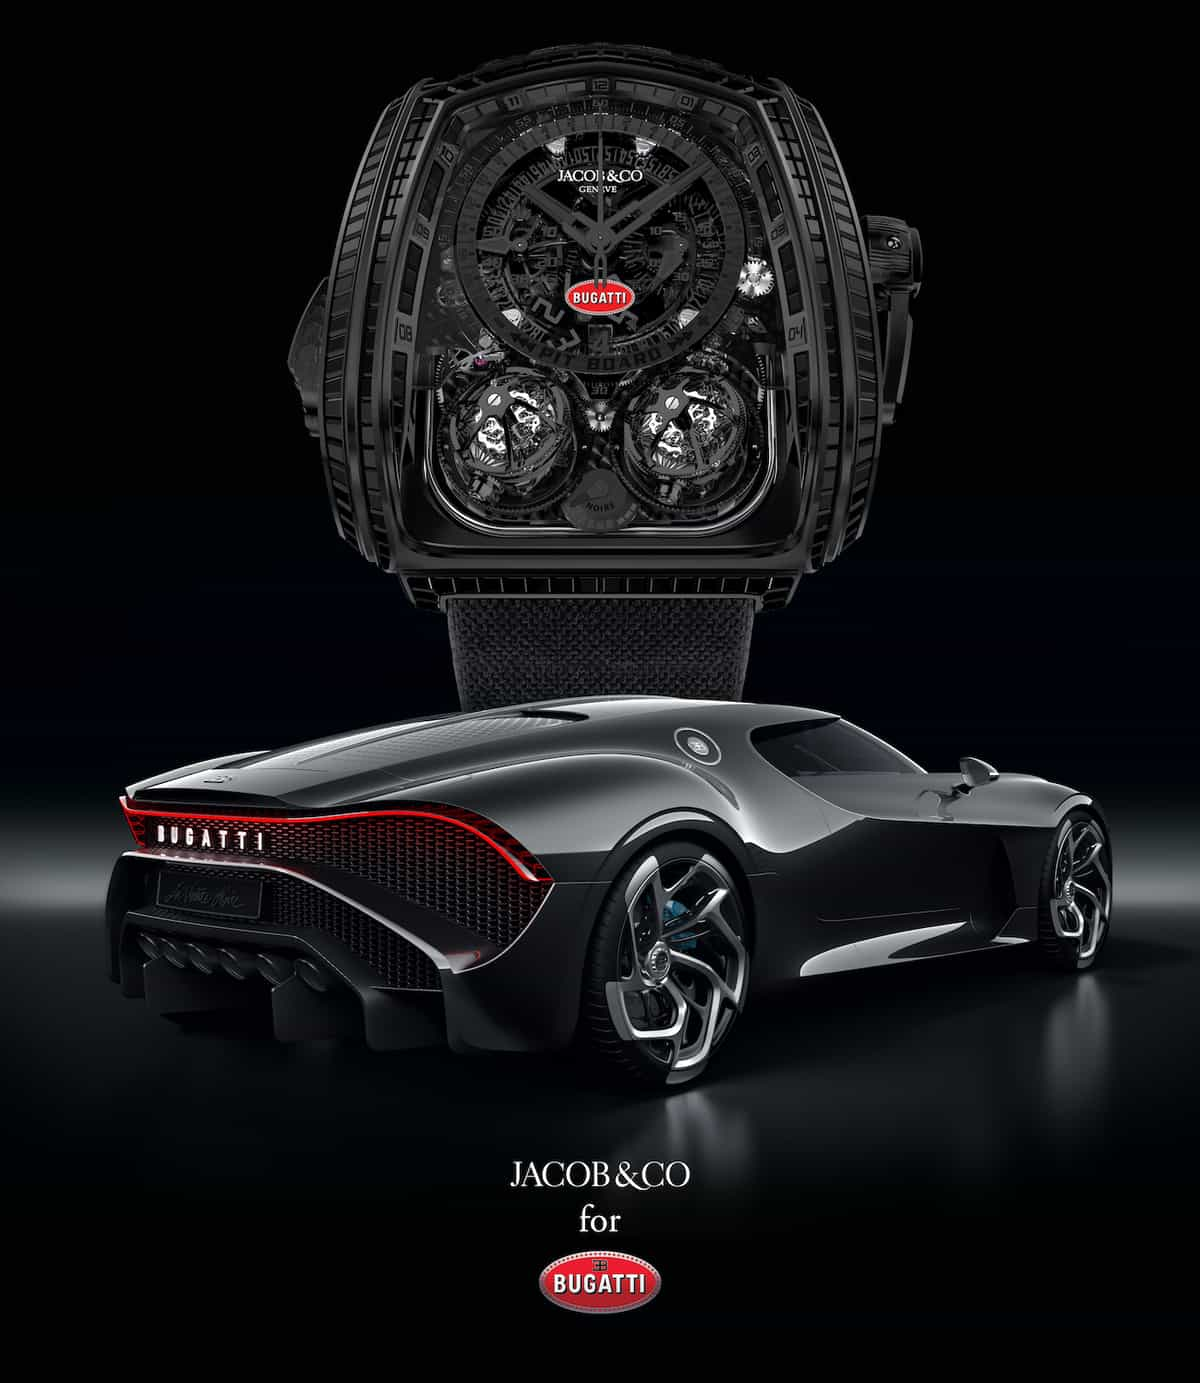 Jacob & Co. Twin Turbo Furious Bugatti La Montre Noire 2